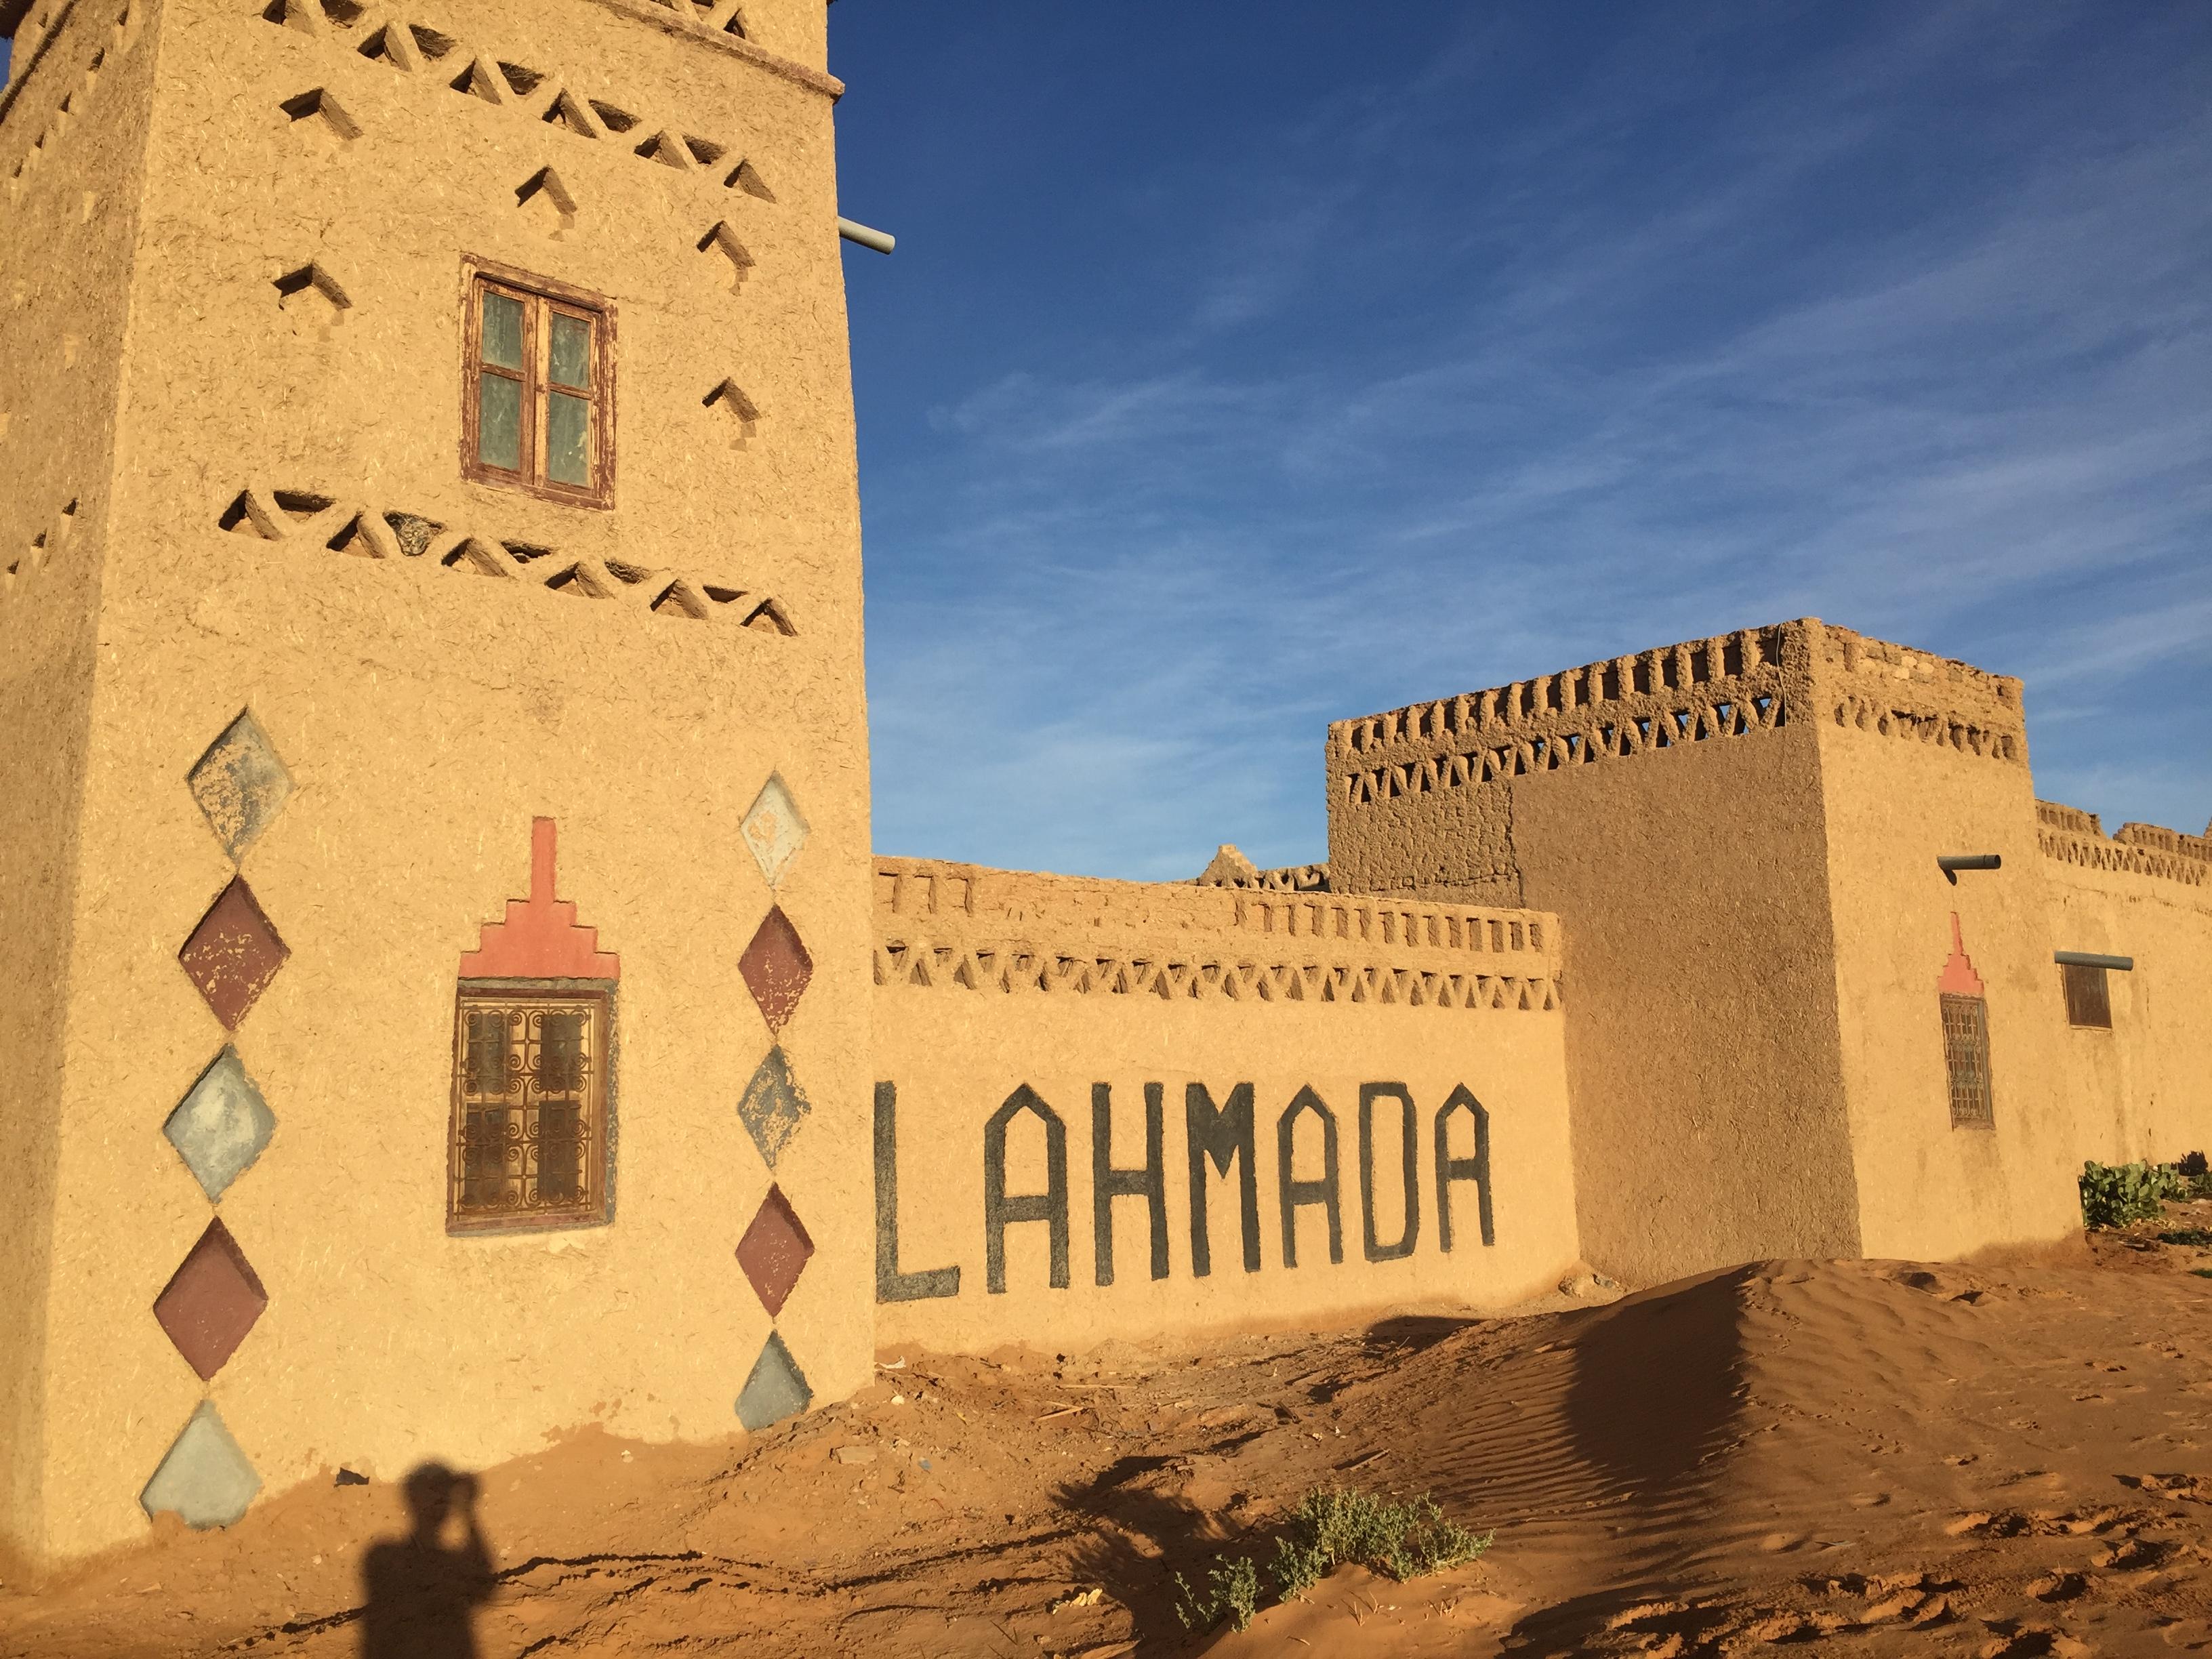 lahmada hotel in sahara